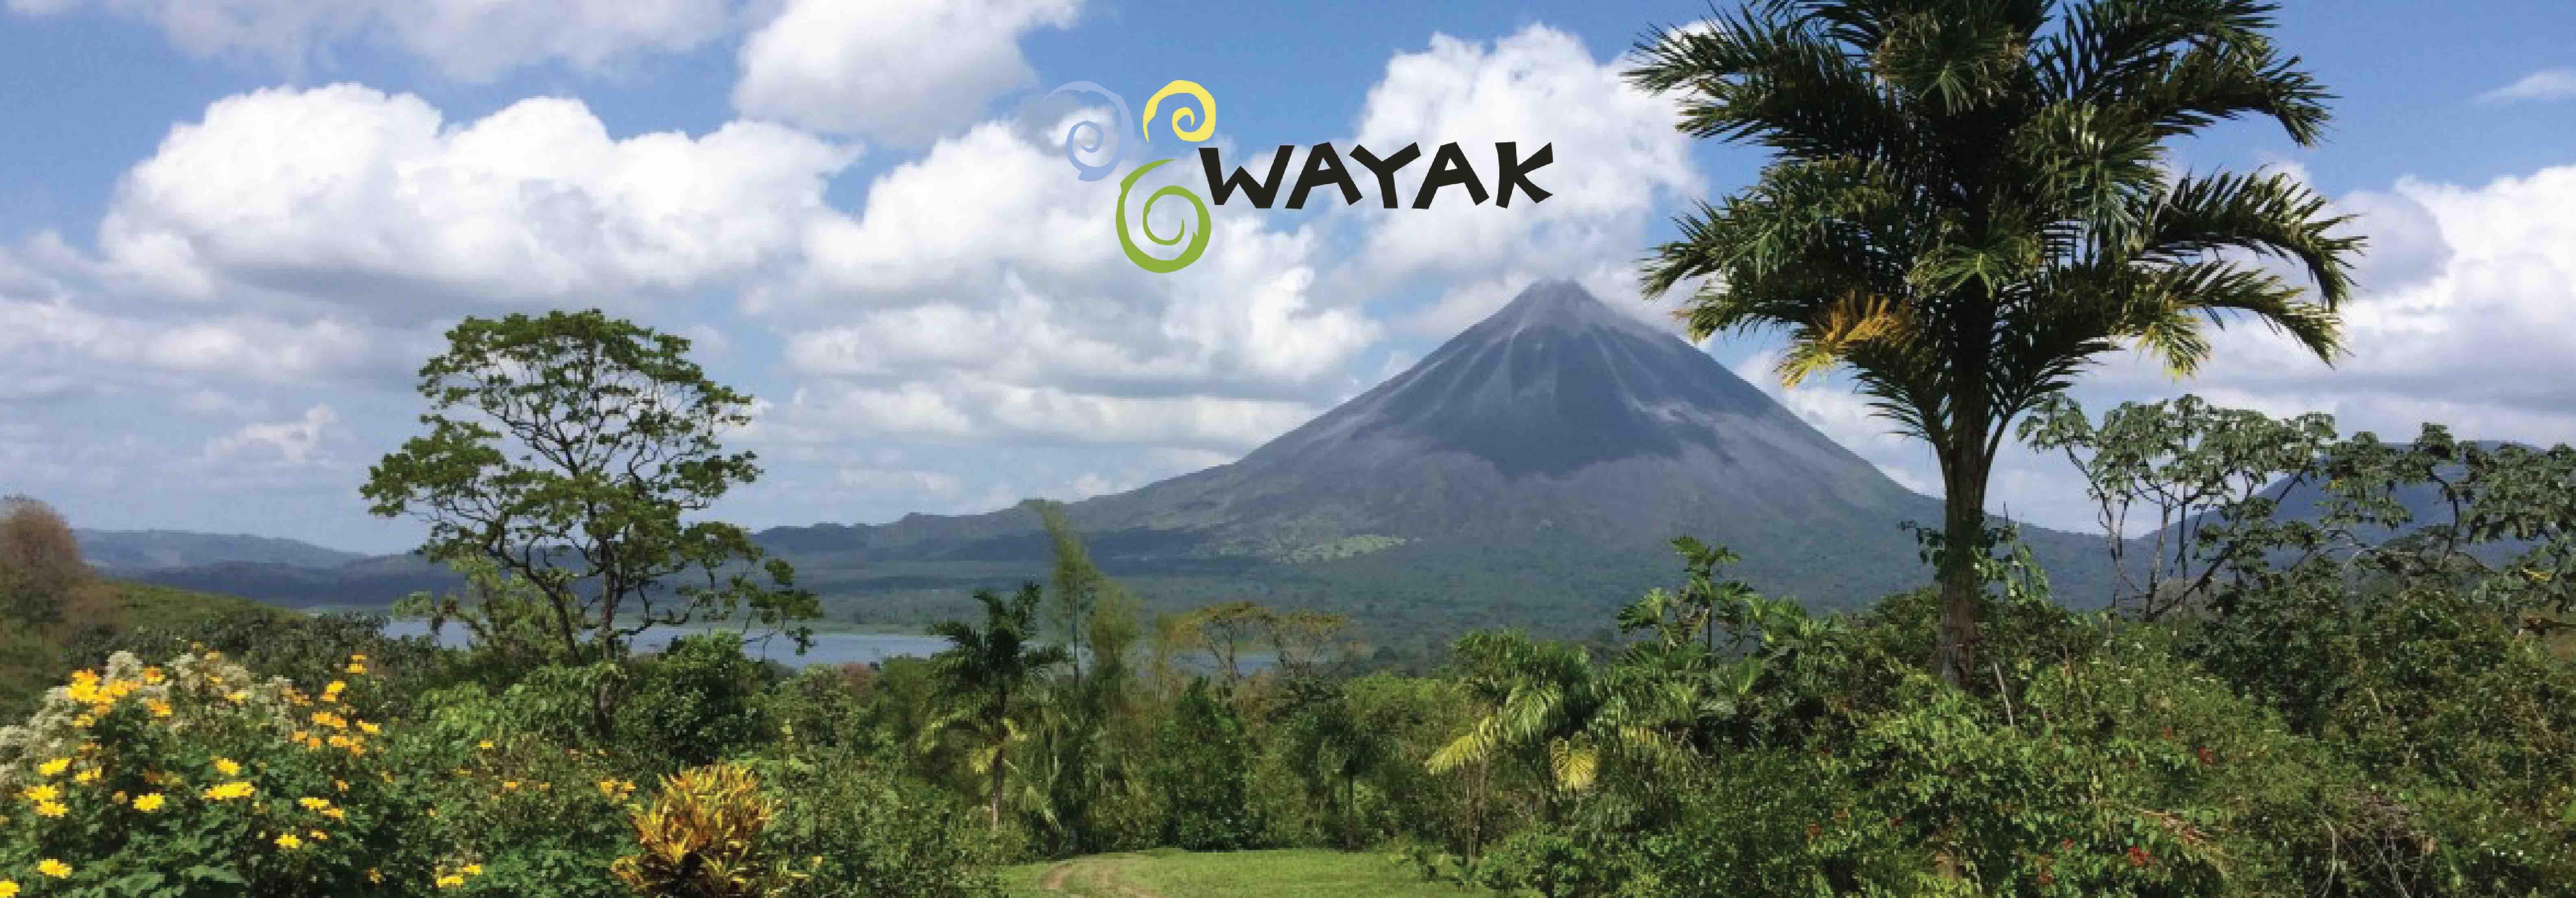 wayak